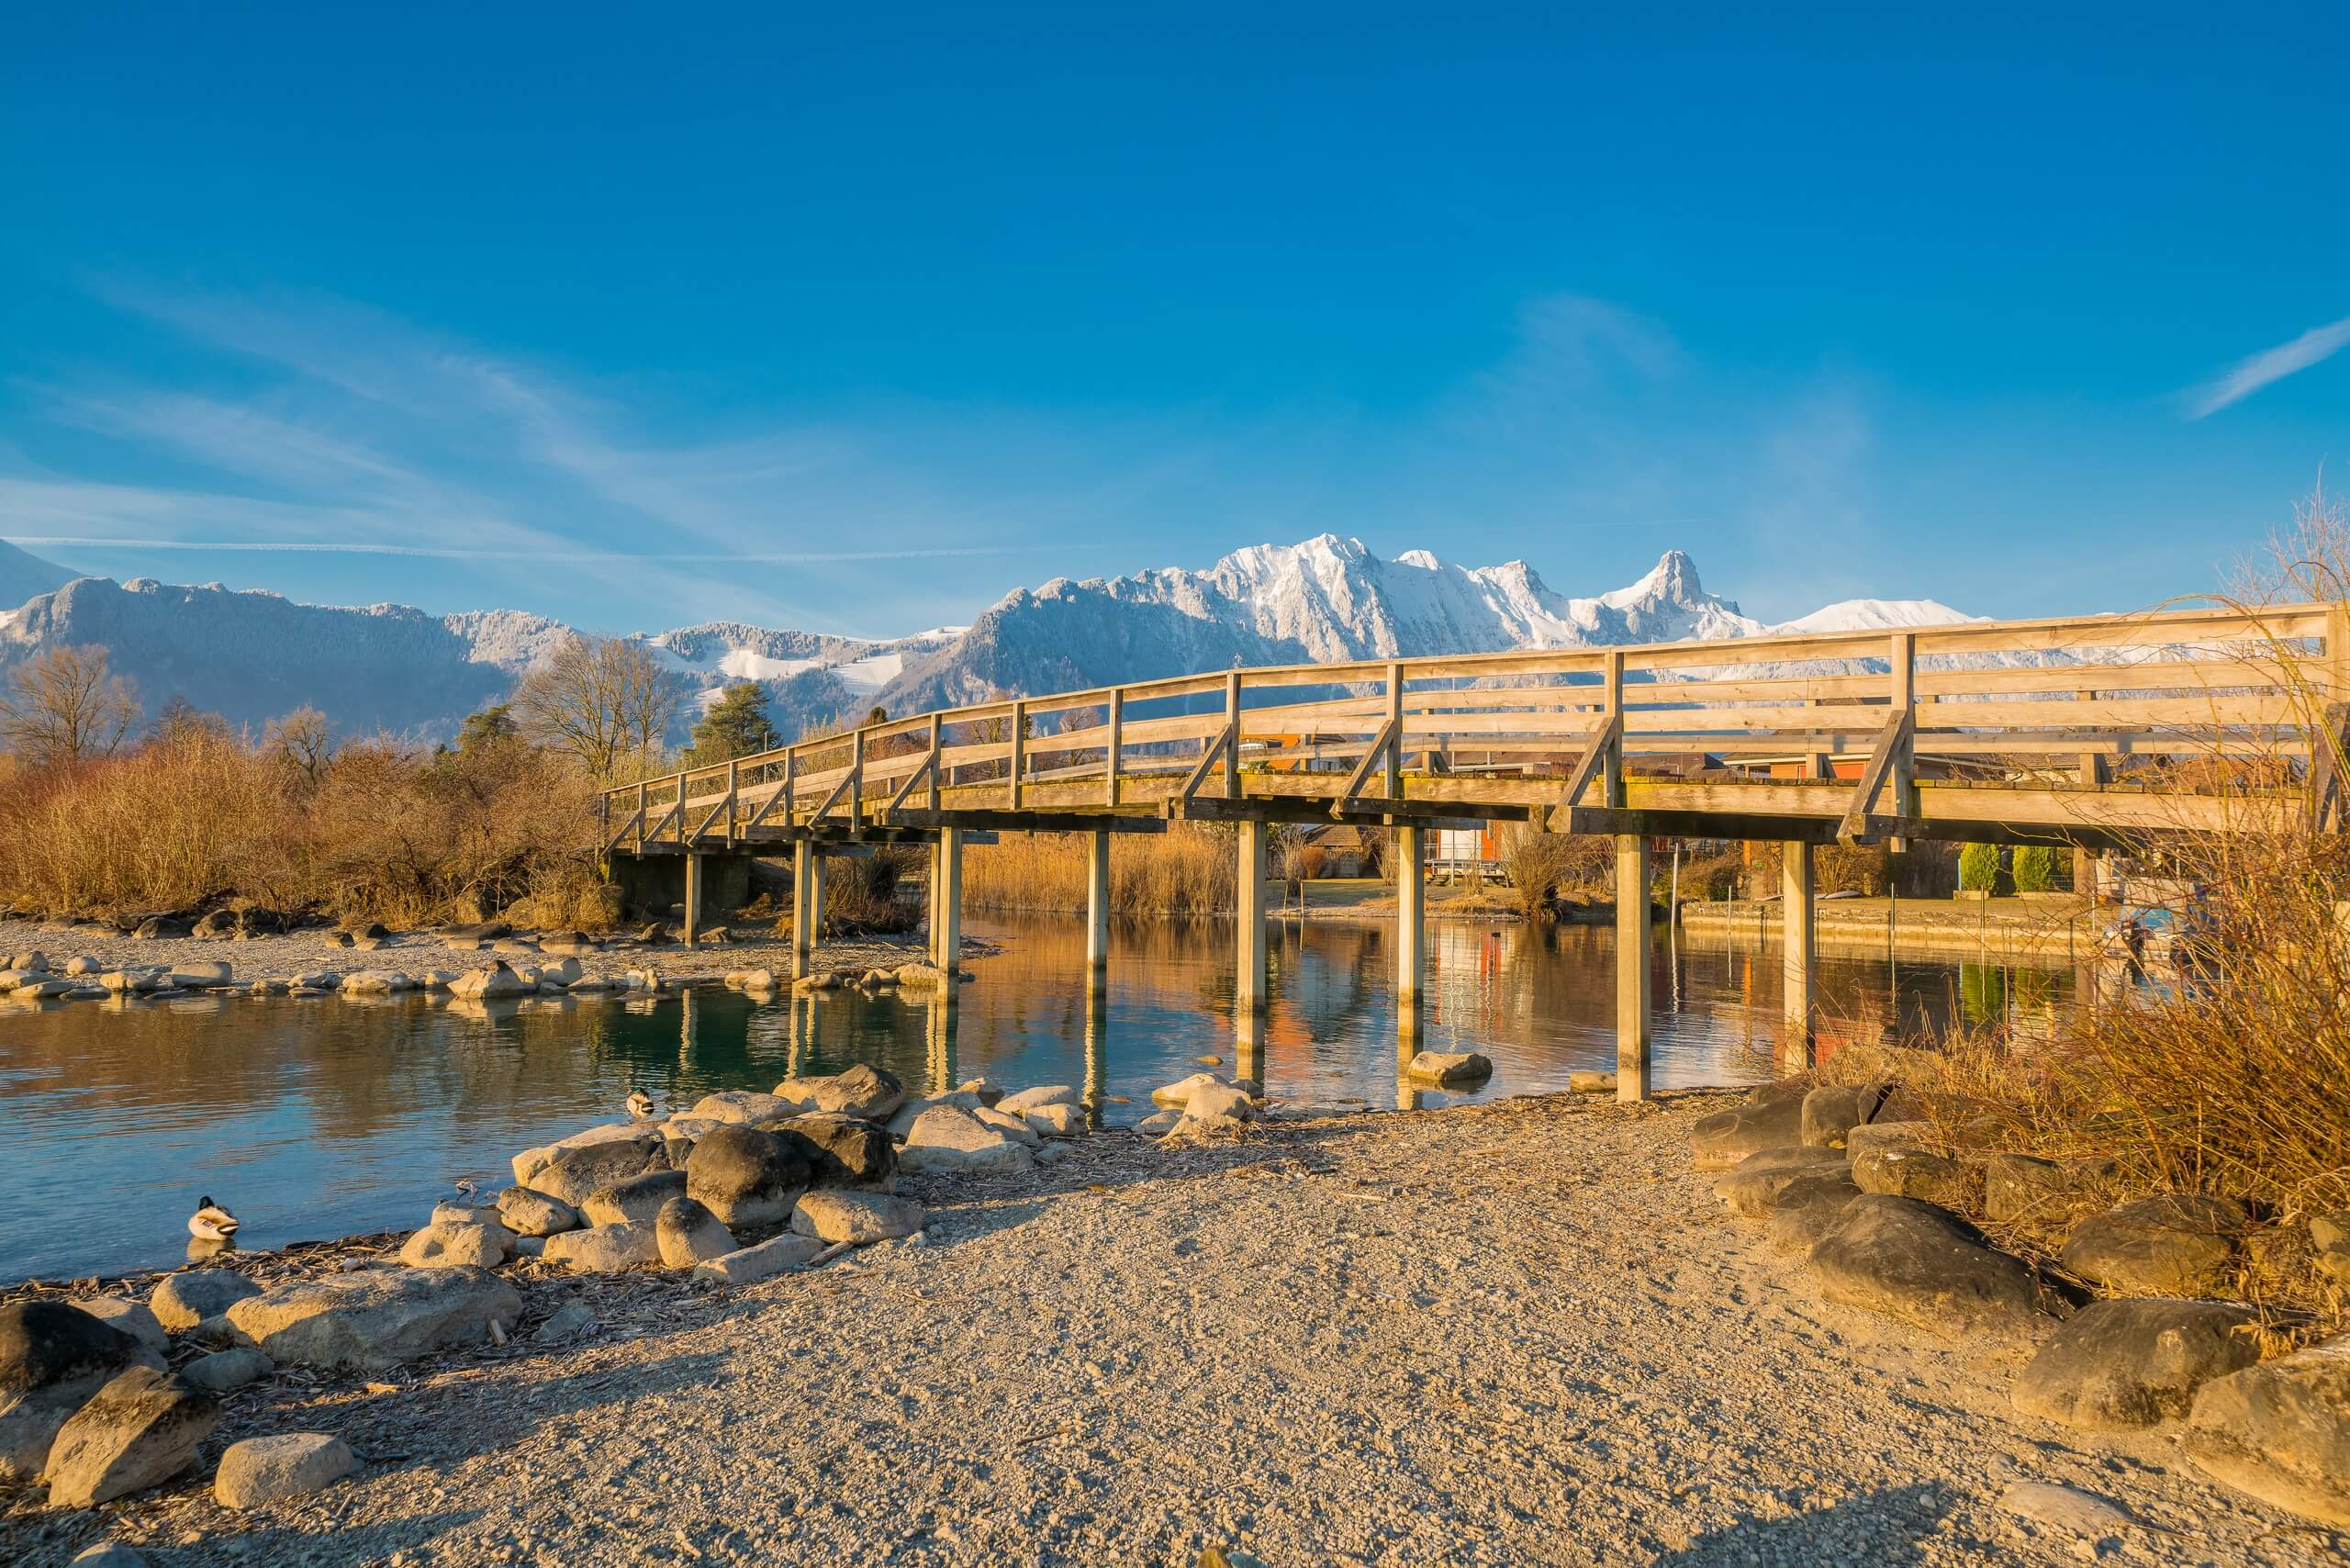 thun-bonstettenpark-winter-sand-bruecke-stockhorn-morgen-winteraktivitaeten